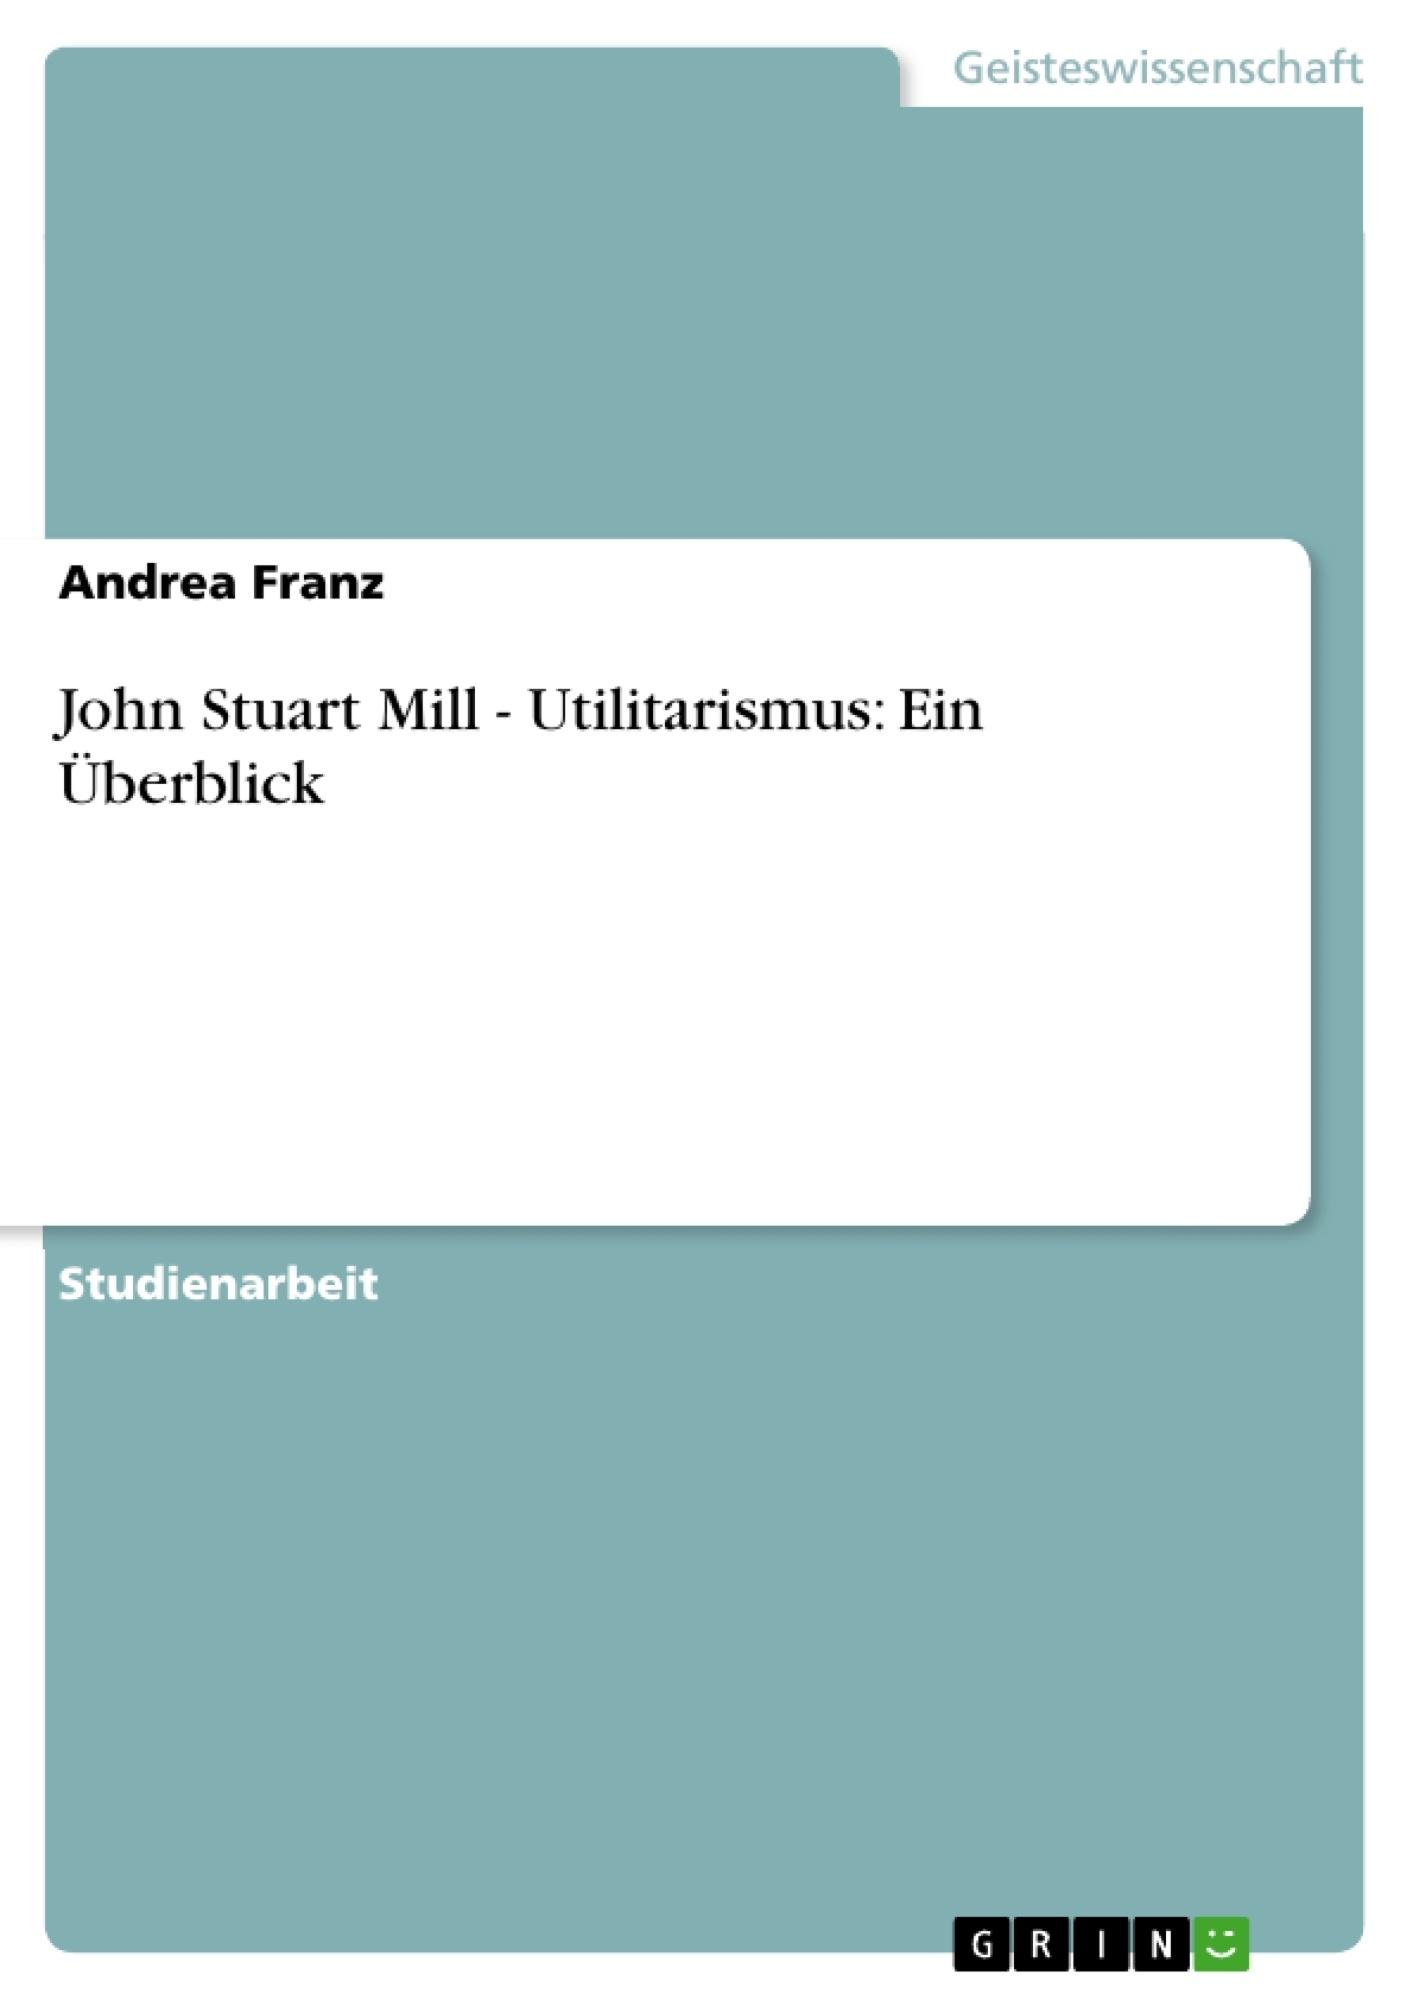 Titel: John Stuart Mill - Utilitarismus: Ein Überblick